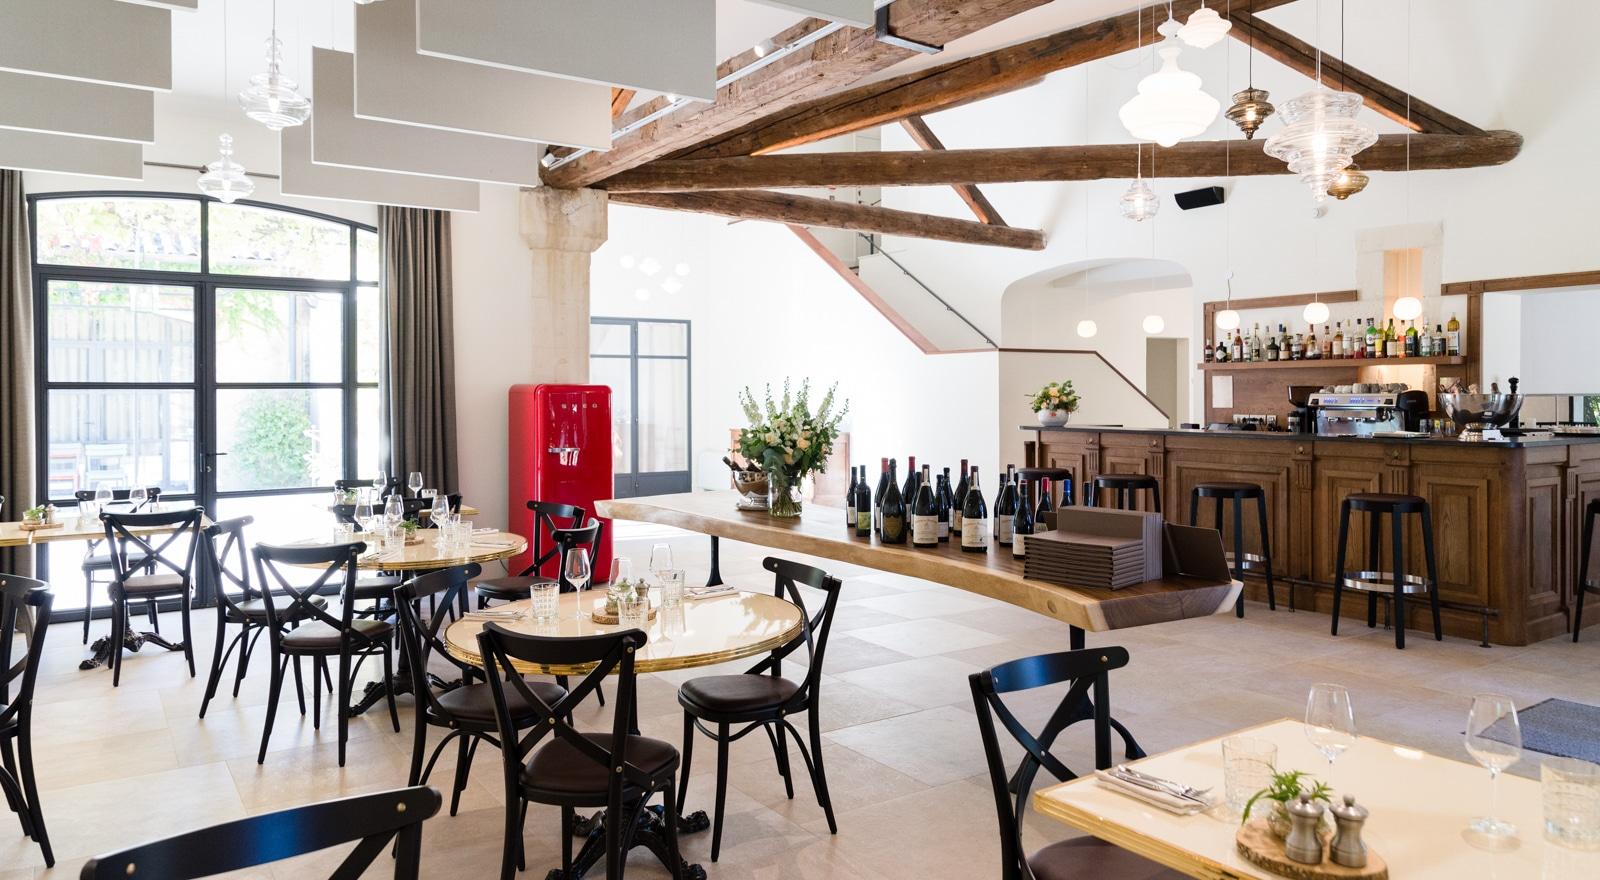 The bistro de Montcaud has around 50 indoor seats in addition to its wonderful terrace